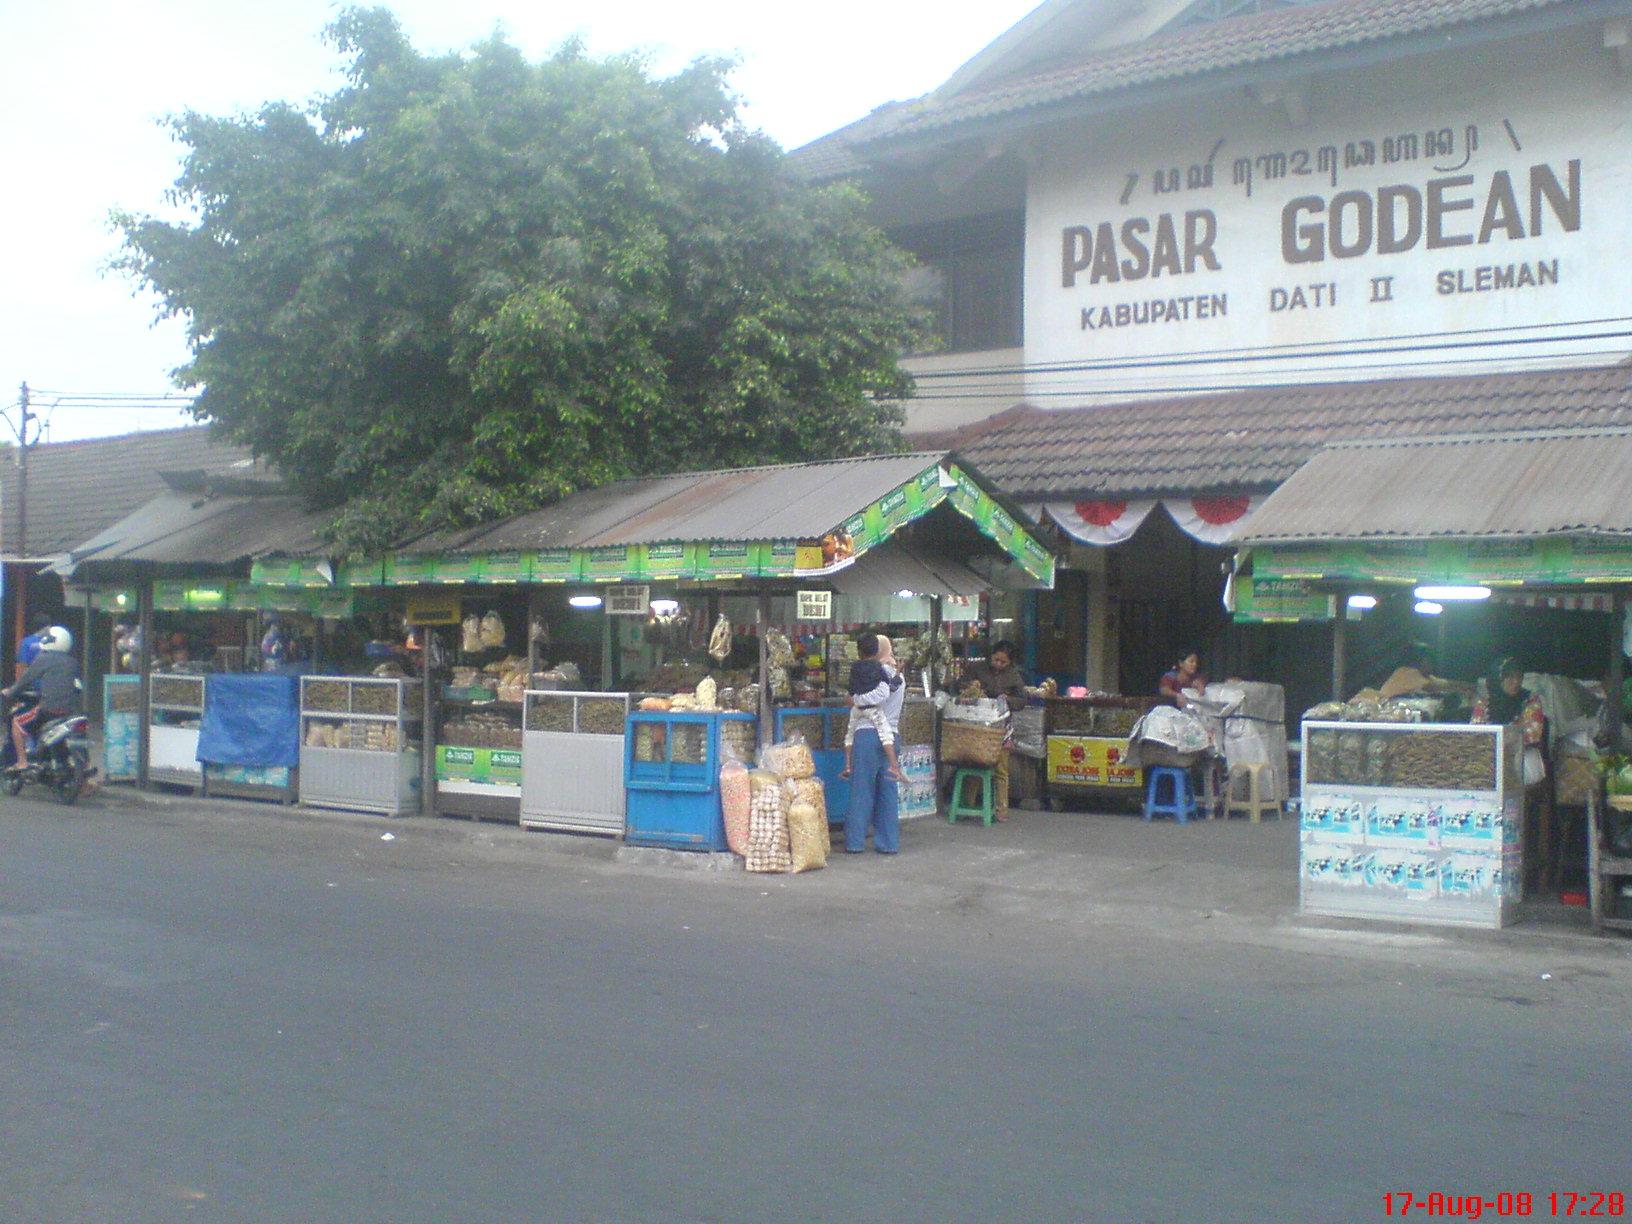 Pasar Godean dan Penjual Belut Goreng